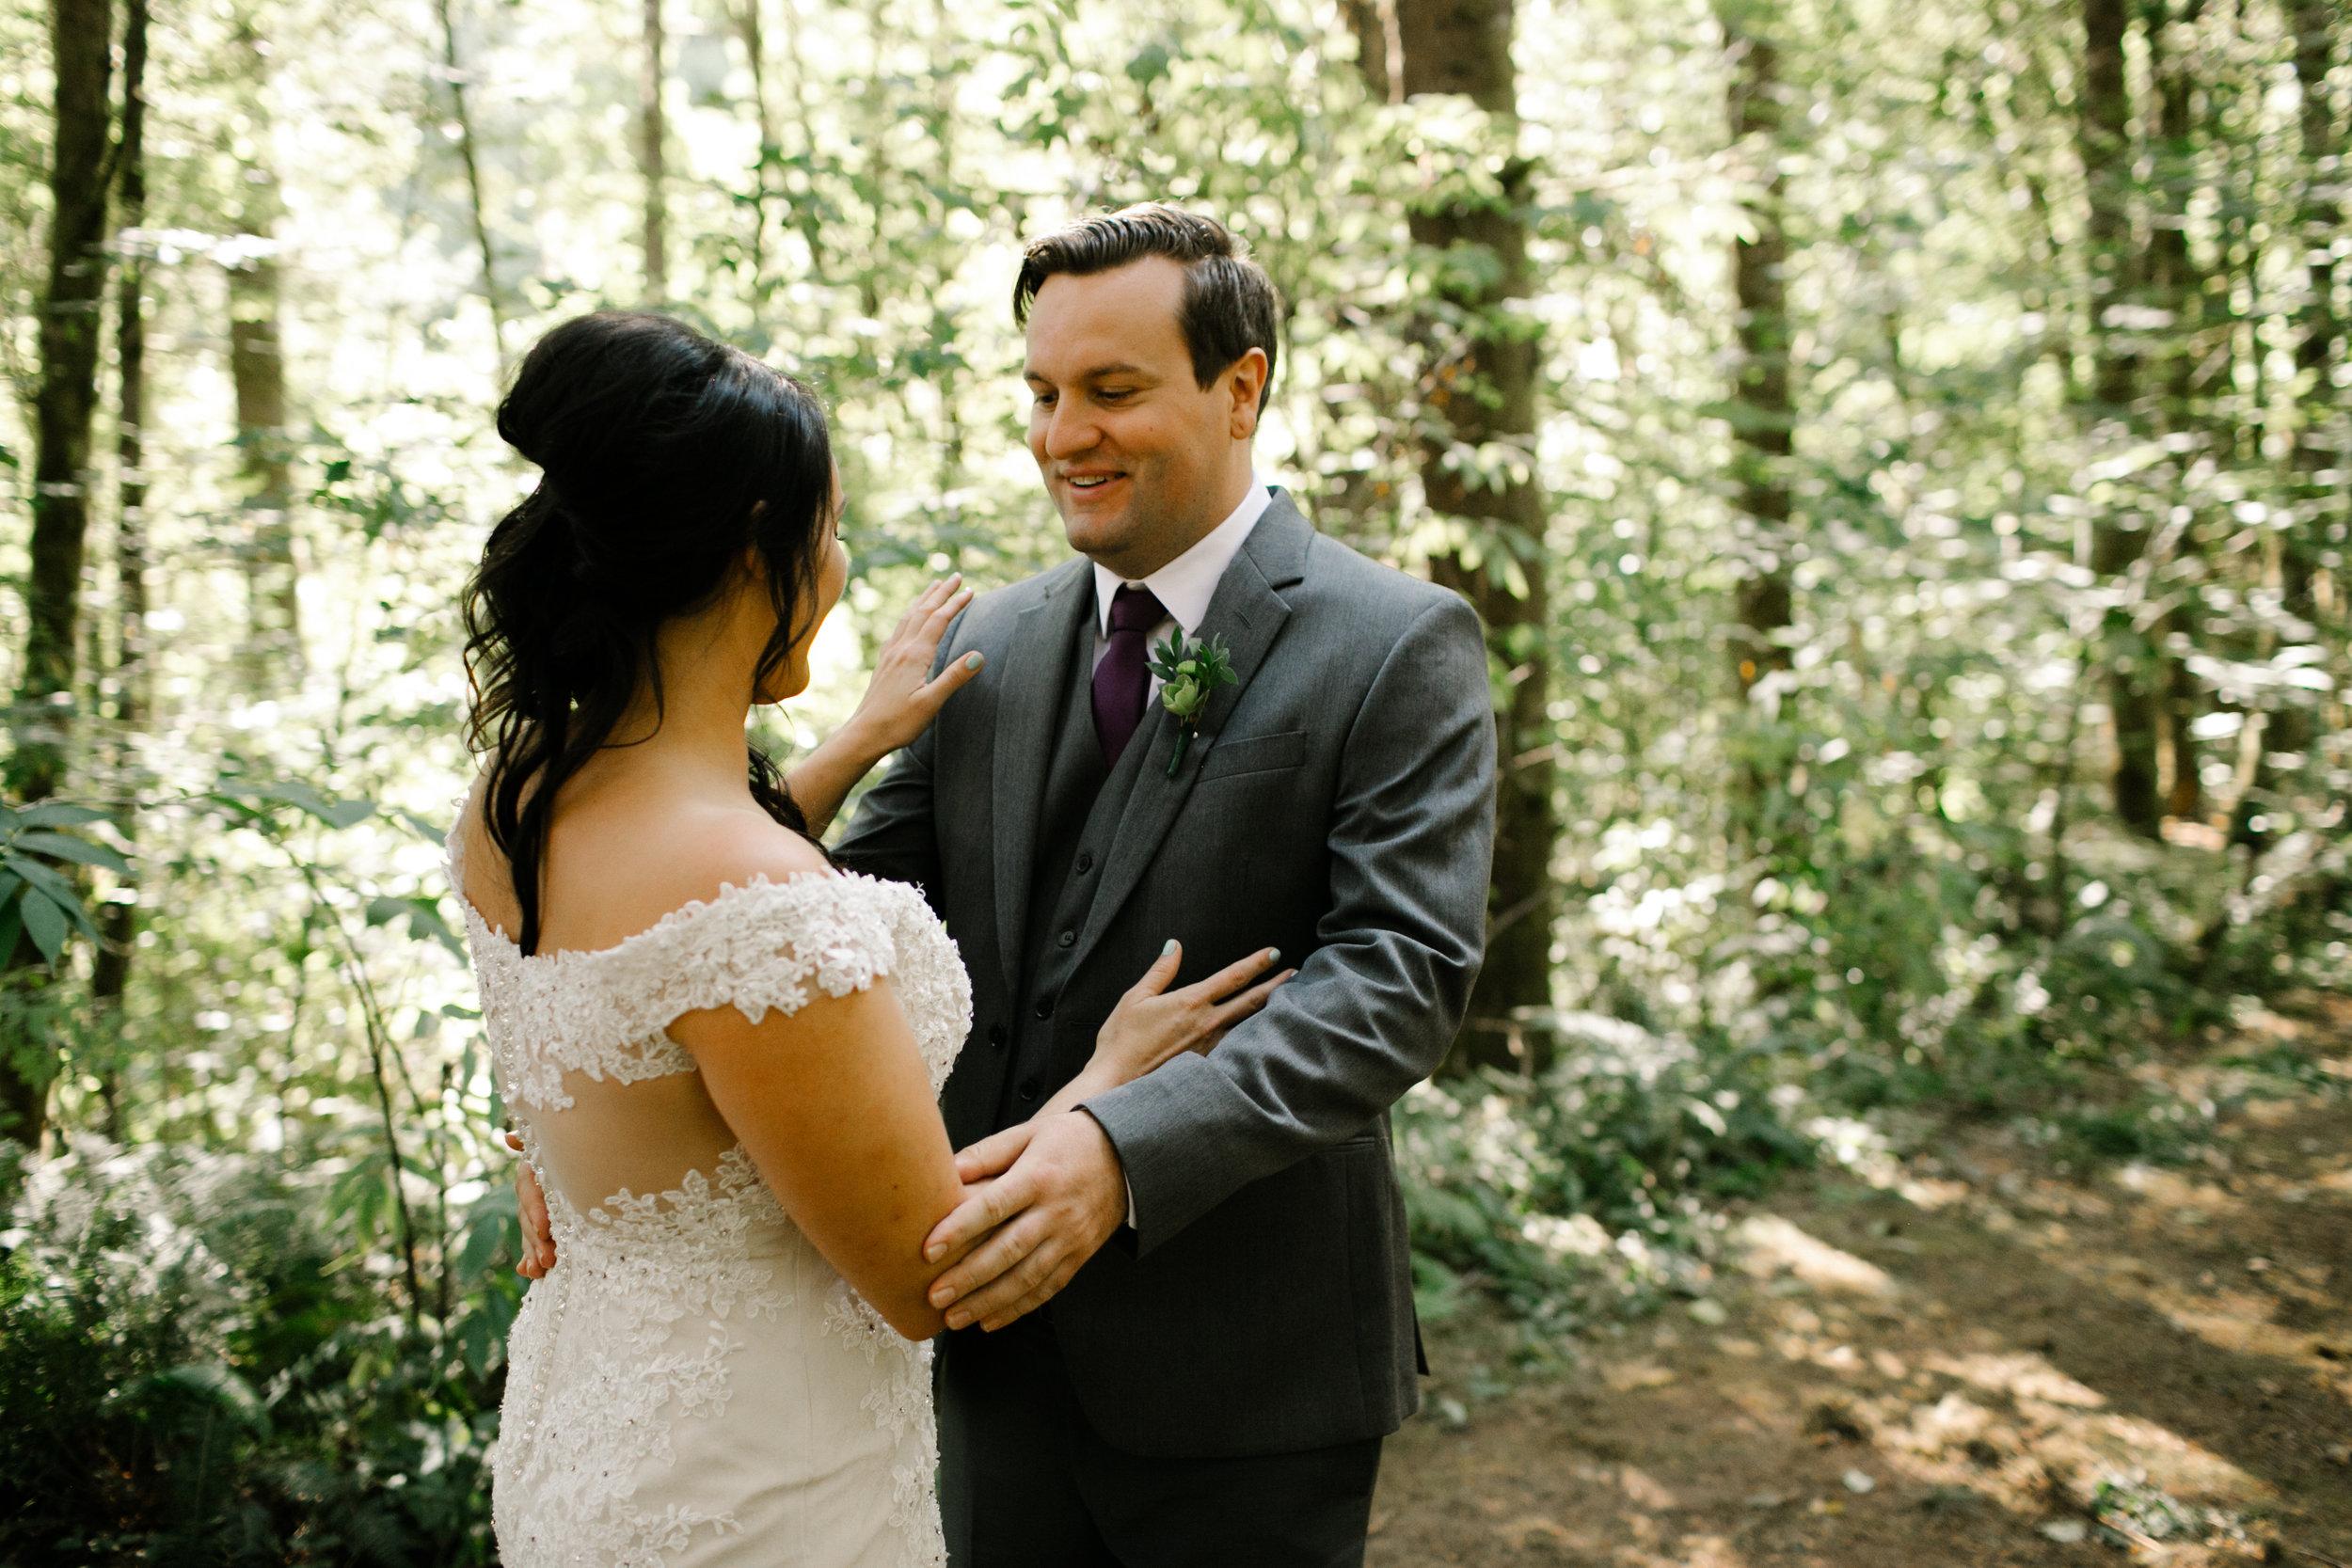 Sevlynn-Photography-Teresa-Chandler-Wedding-12.jpg